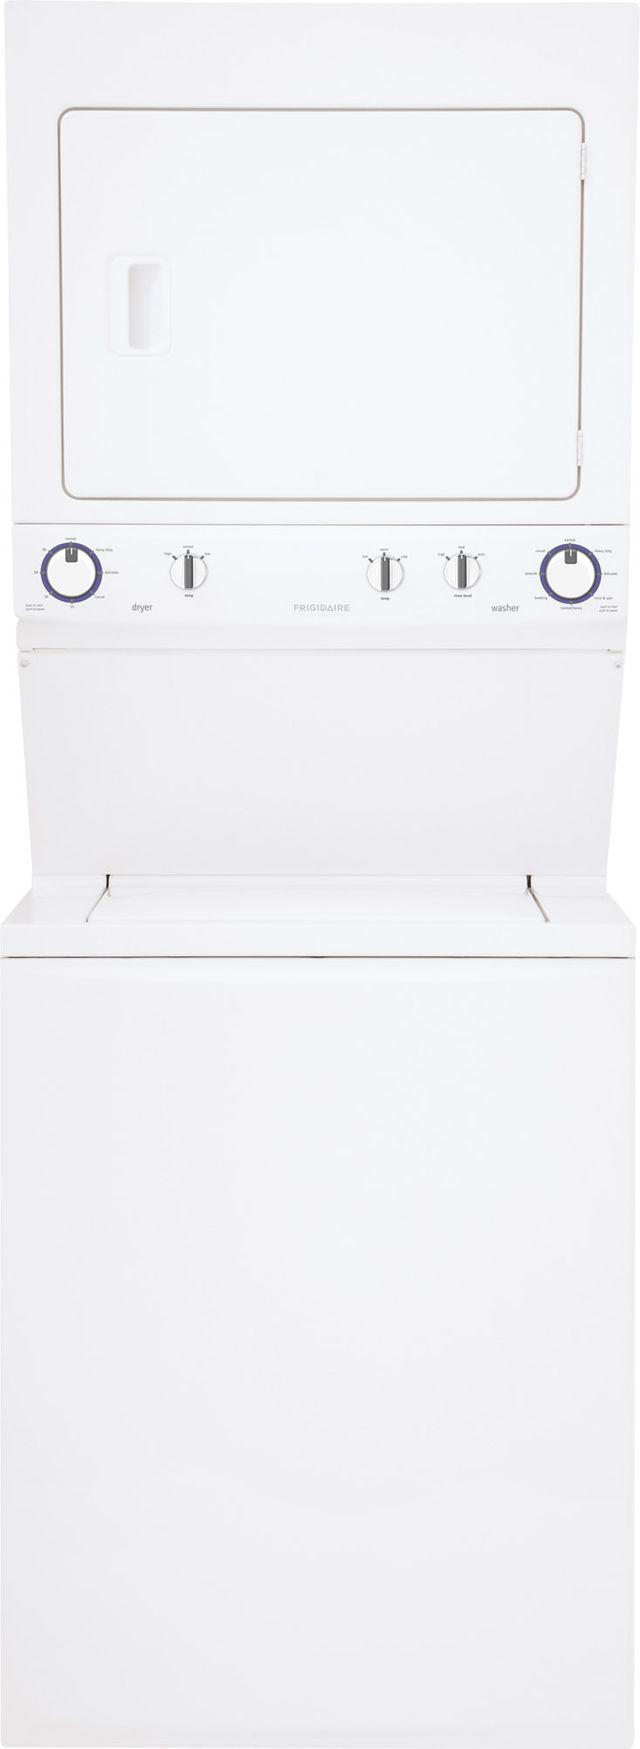 Frigidaire® Spacesaver Stack Laundry-White-FFLG3911QW